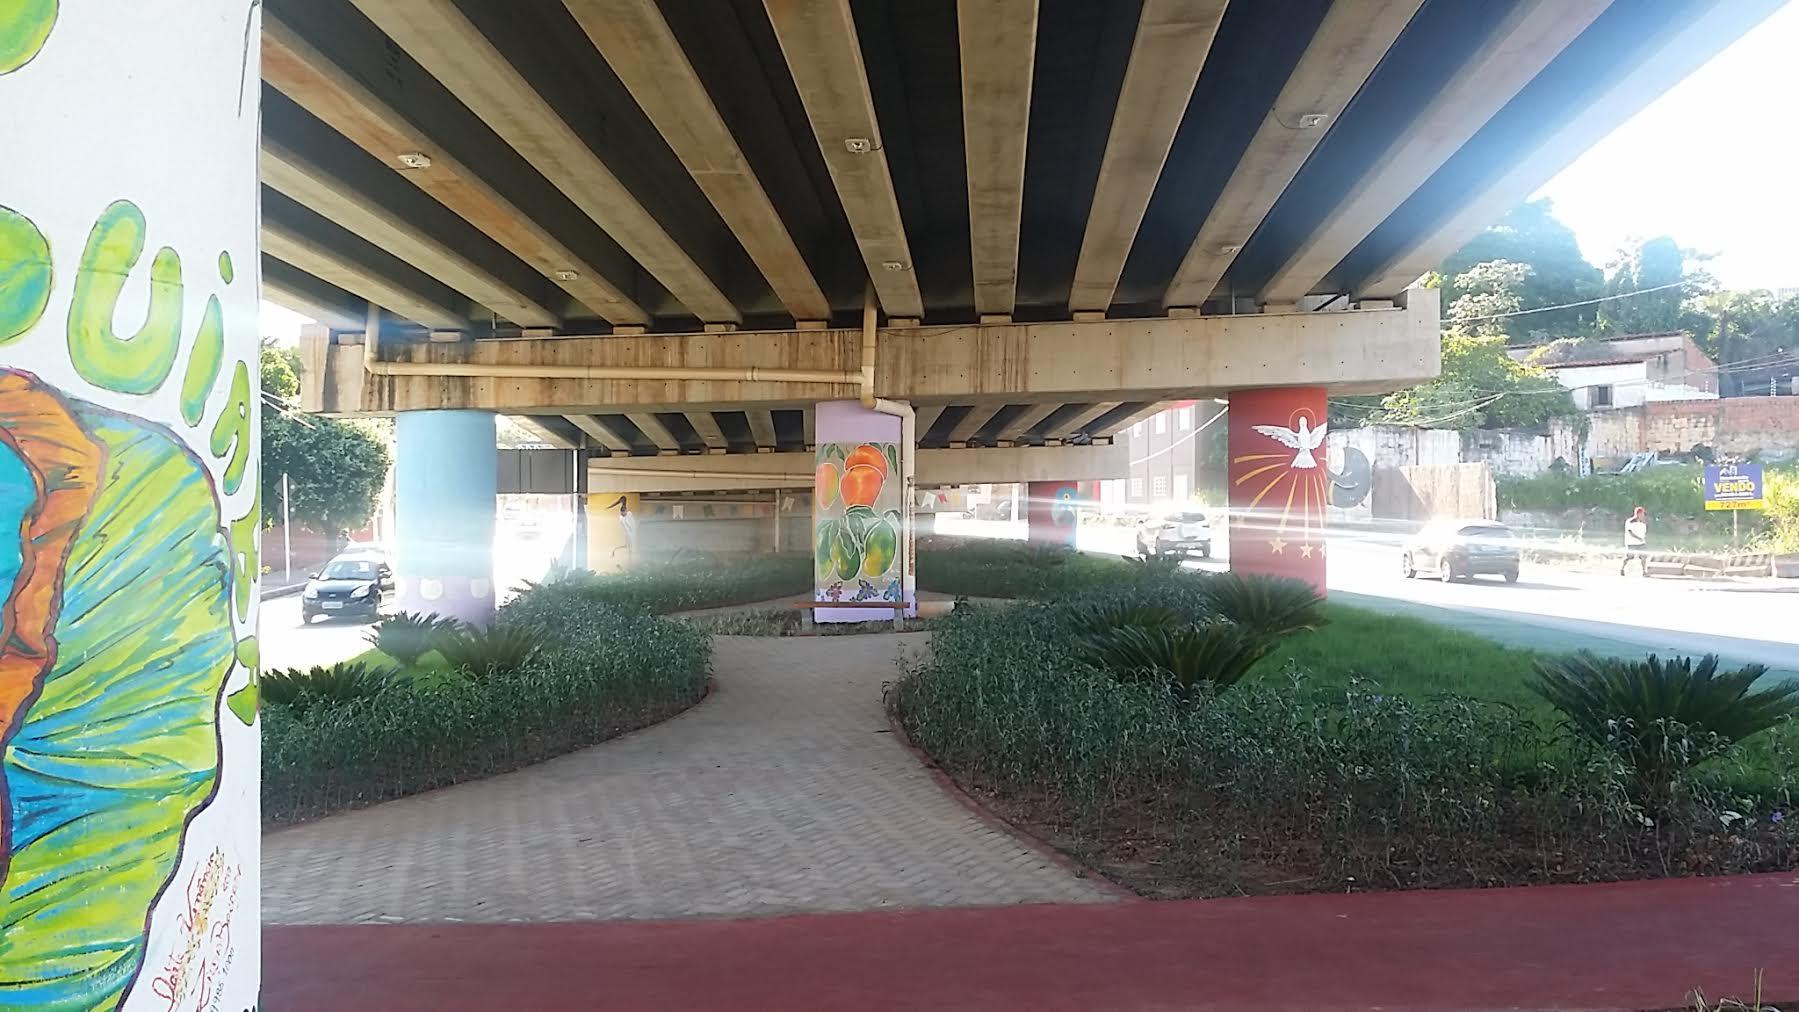 Cuiabá: Ilha da fantasia sob o viaduto